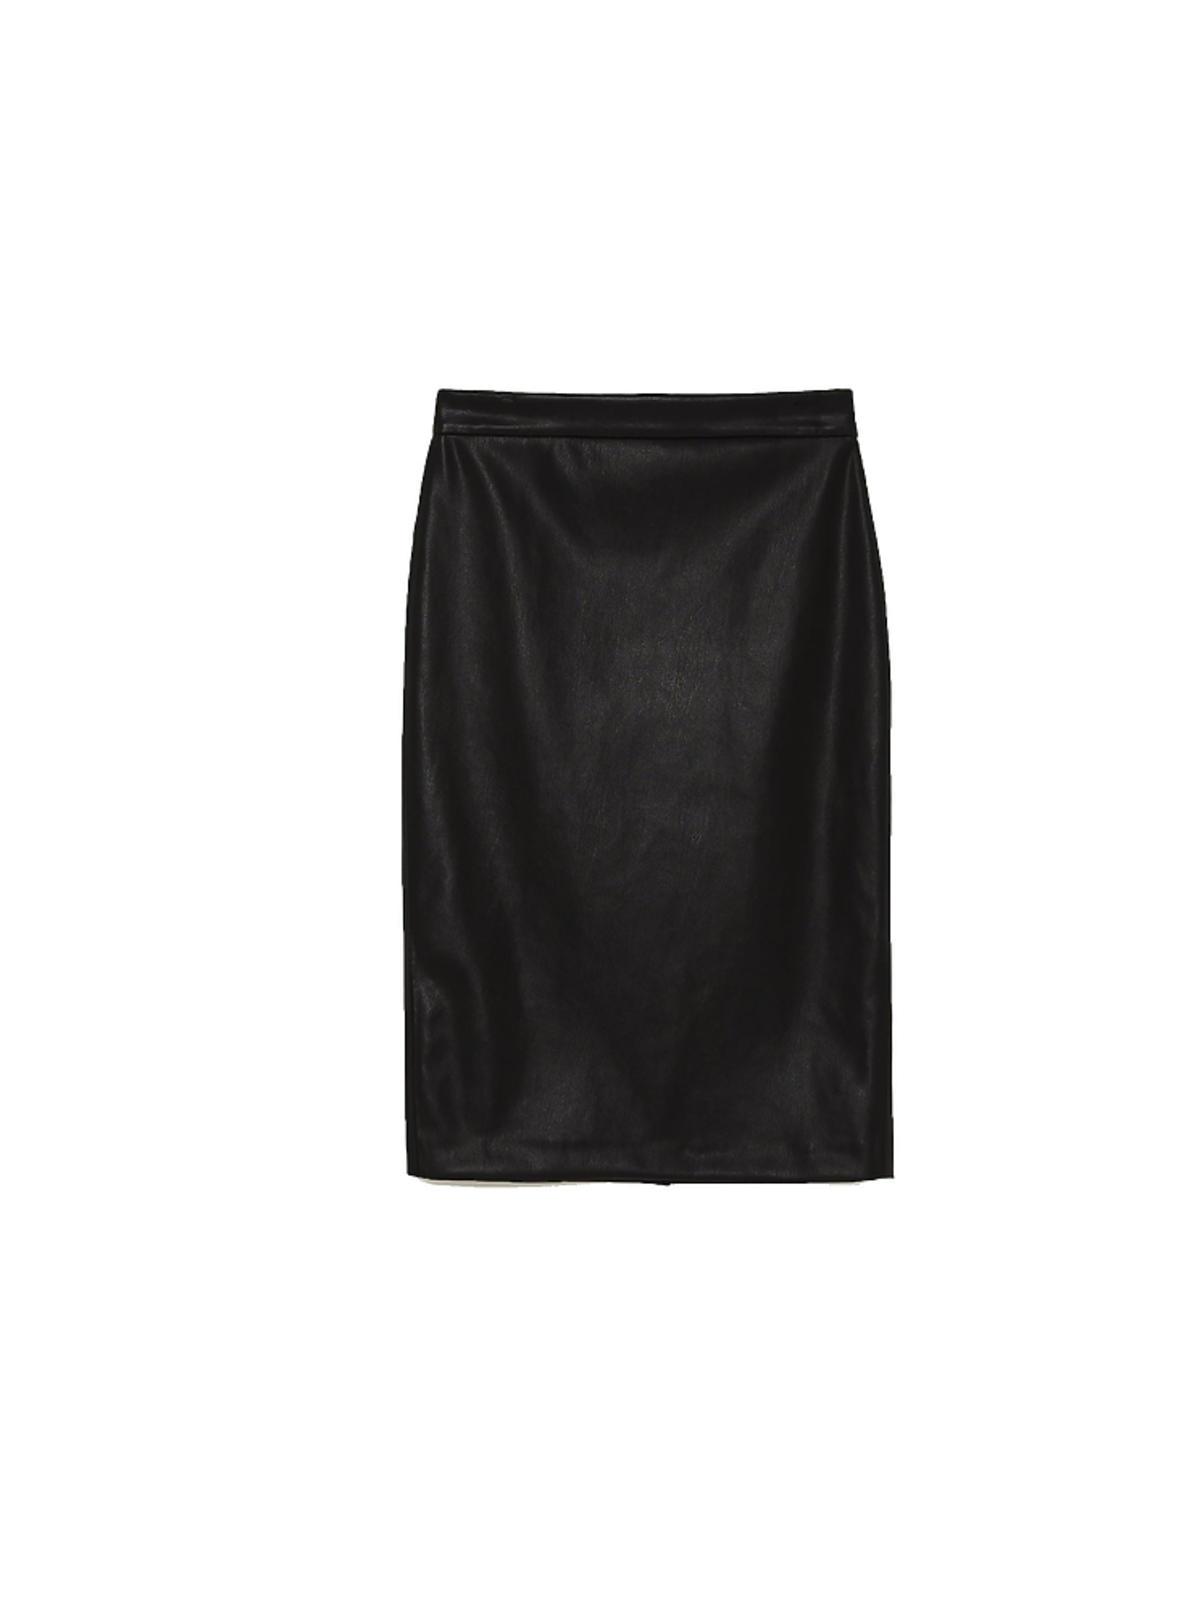 Zara, 99,90 zł